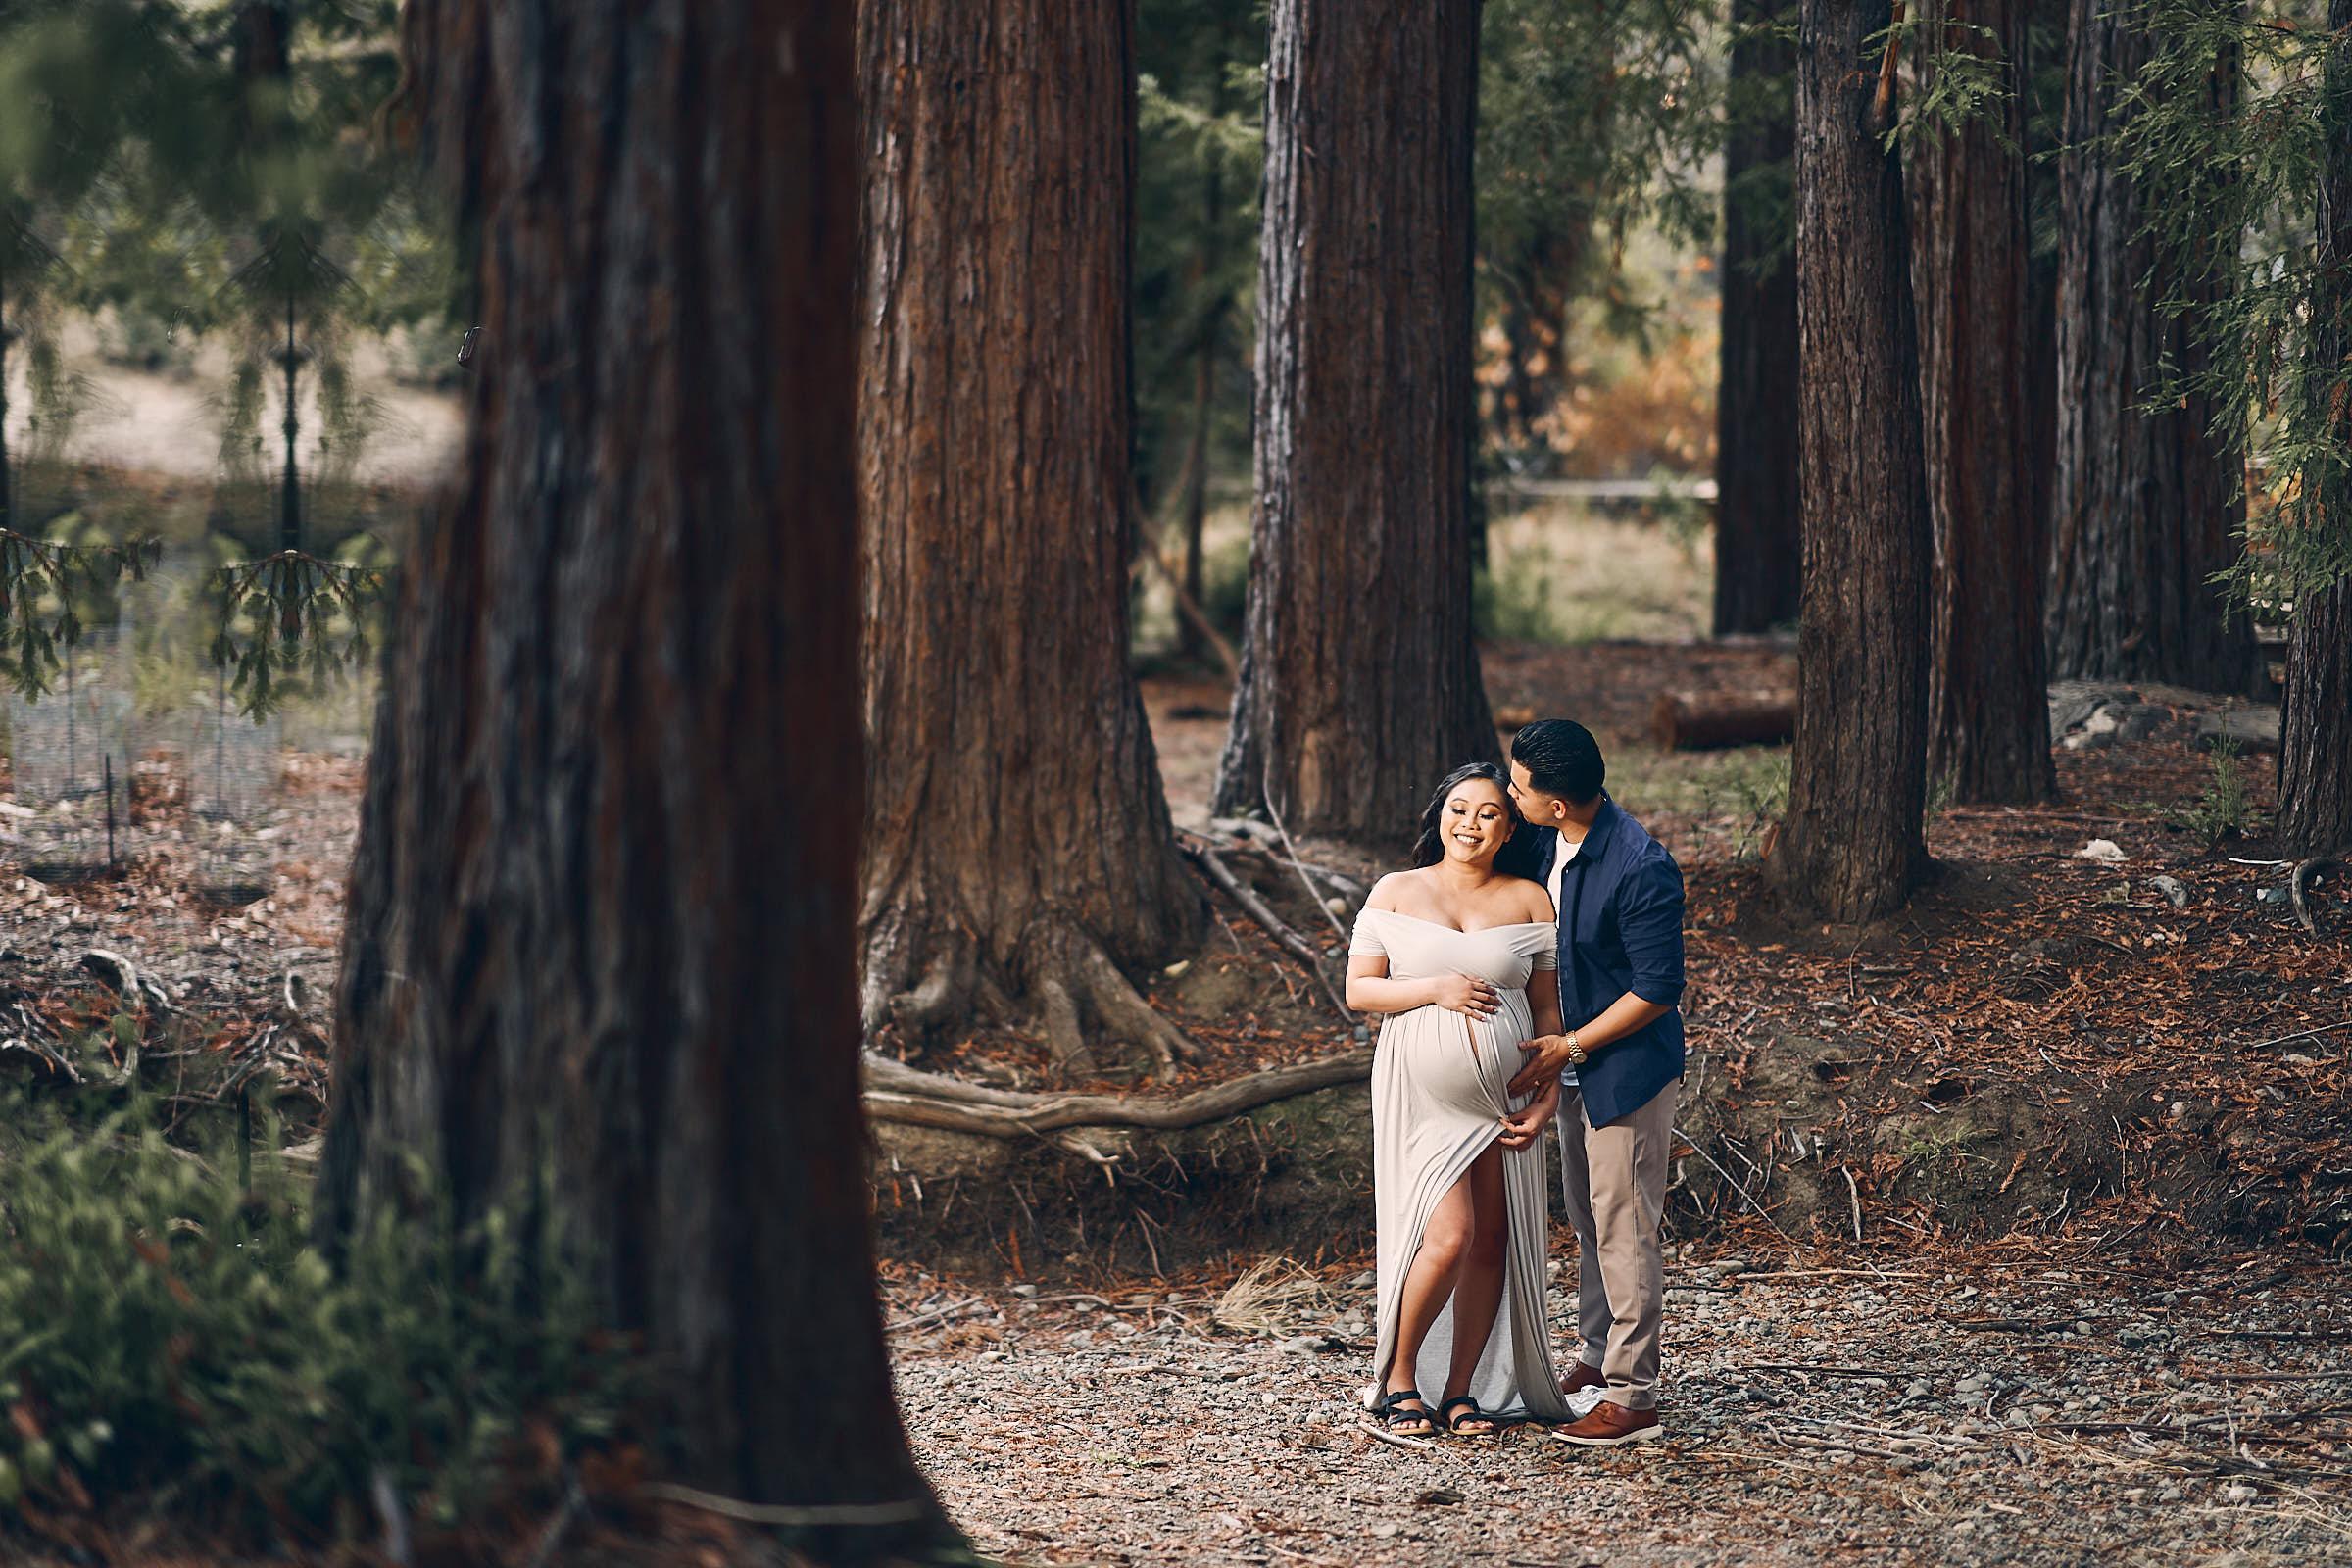 Couples Poses Maternity Photoshoot Redwoods Trees Palo Alto